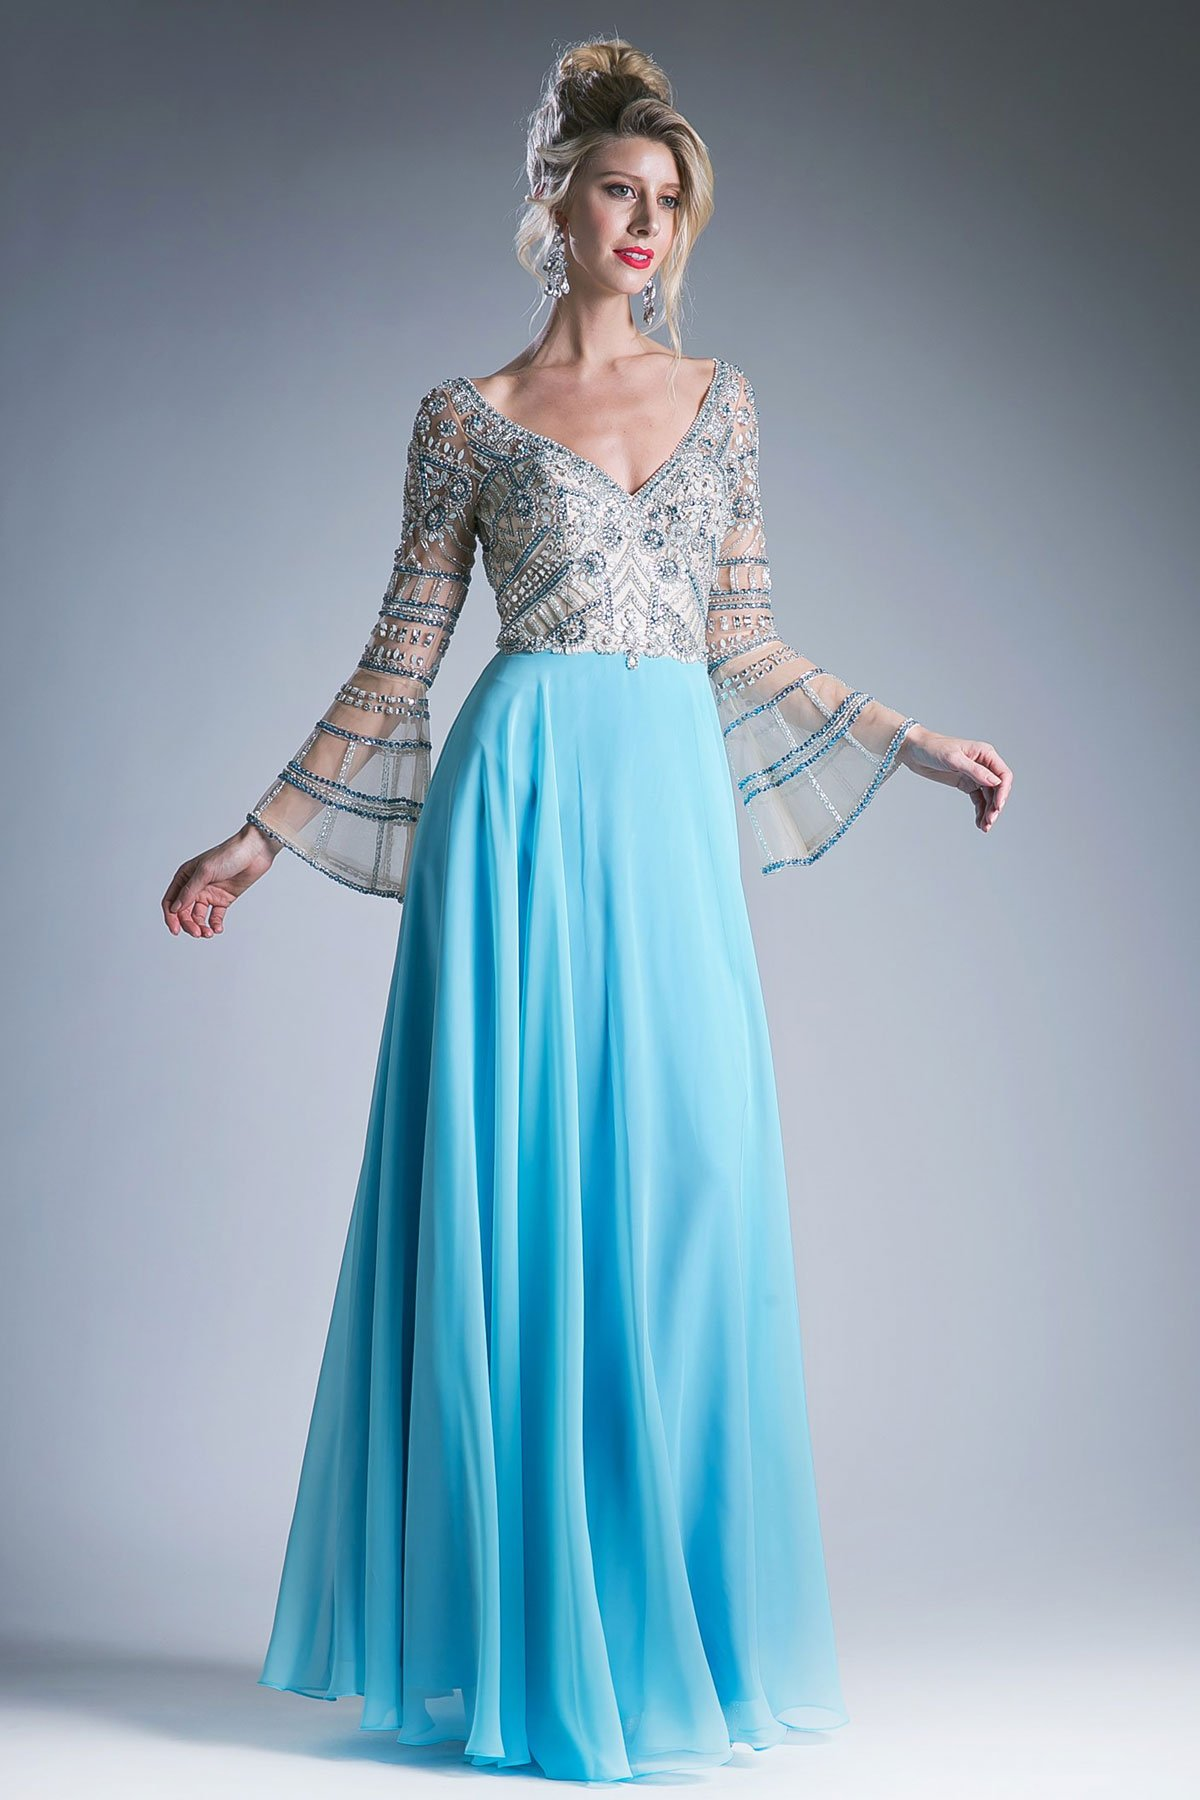 Prom Dress CD71190 | Prom, Bodice and Gemstone